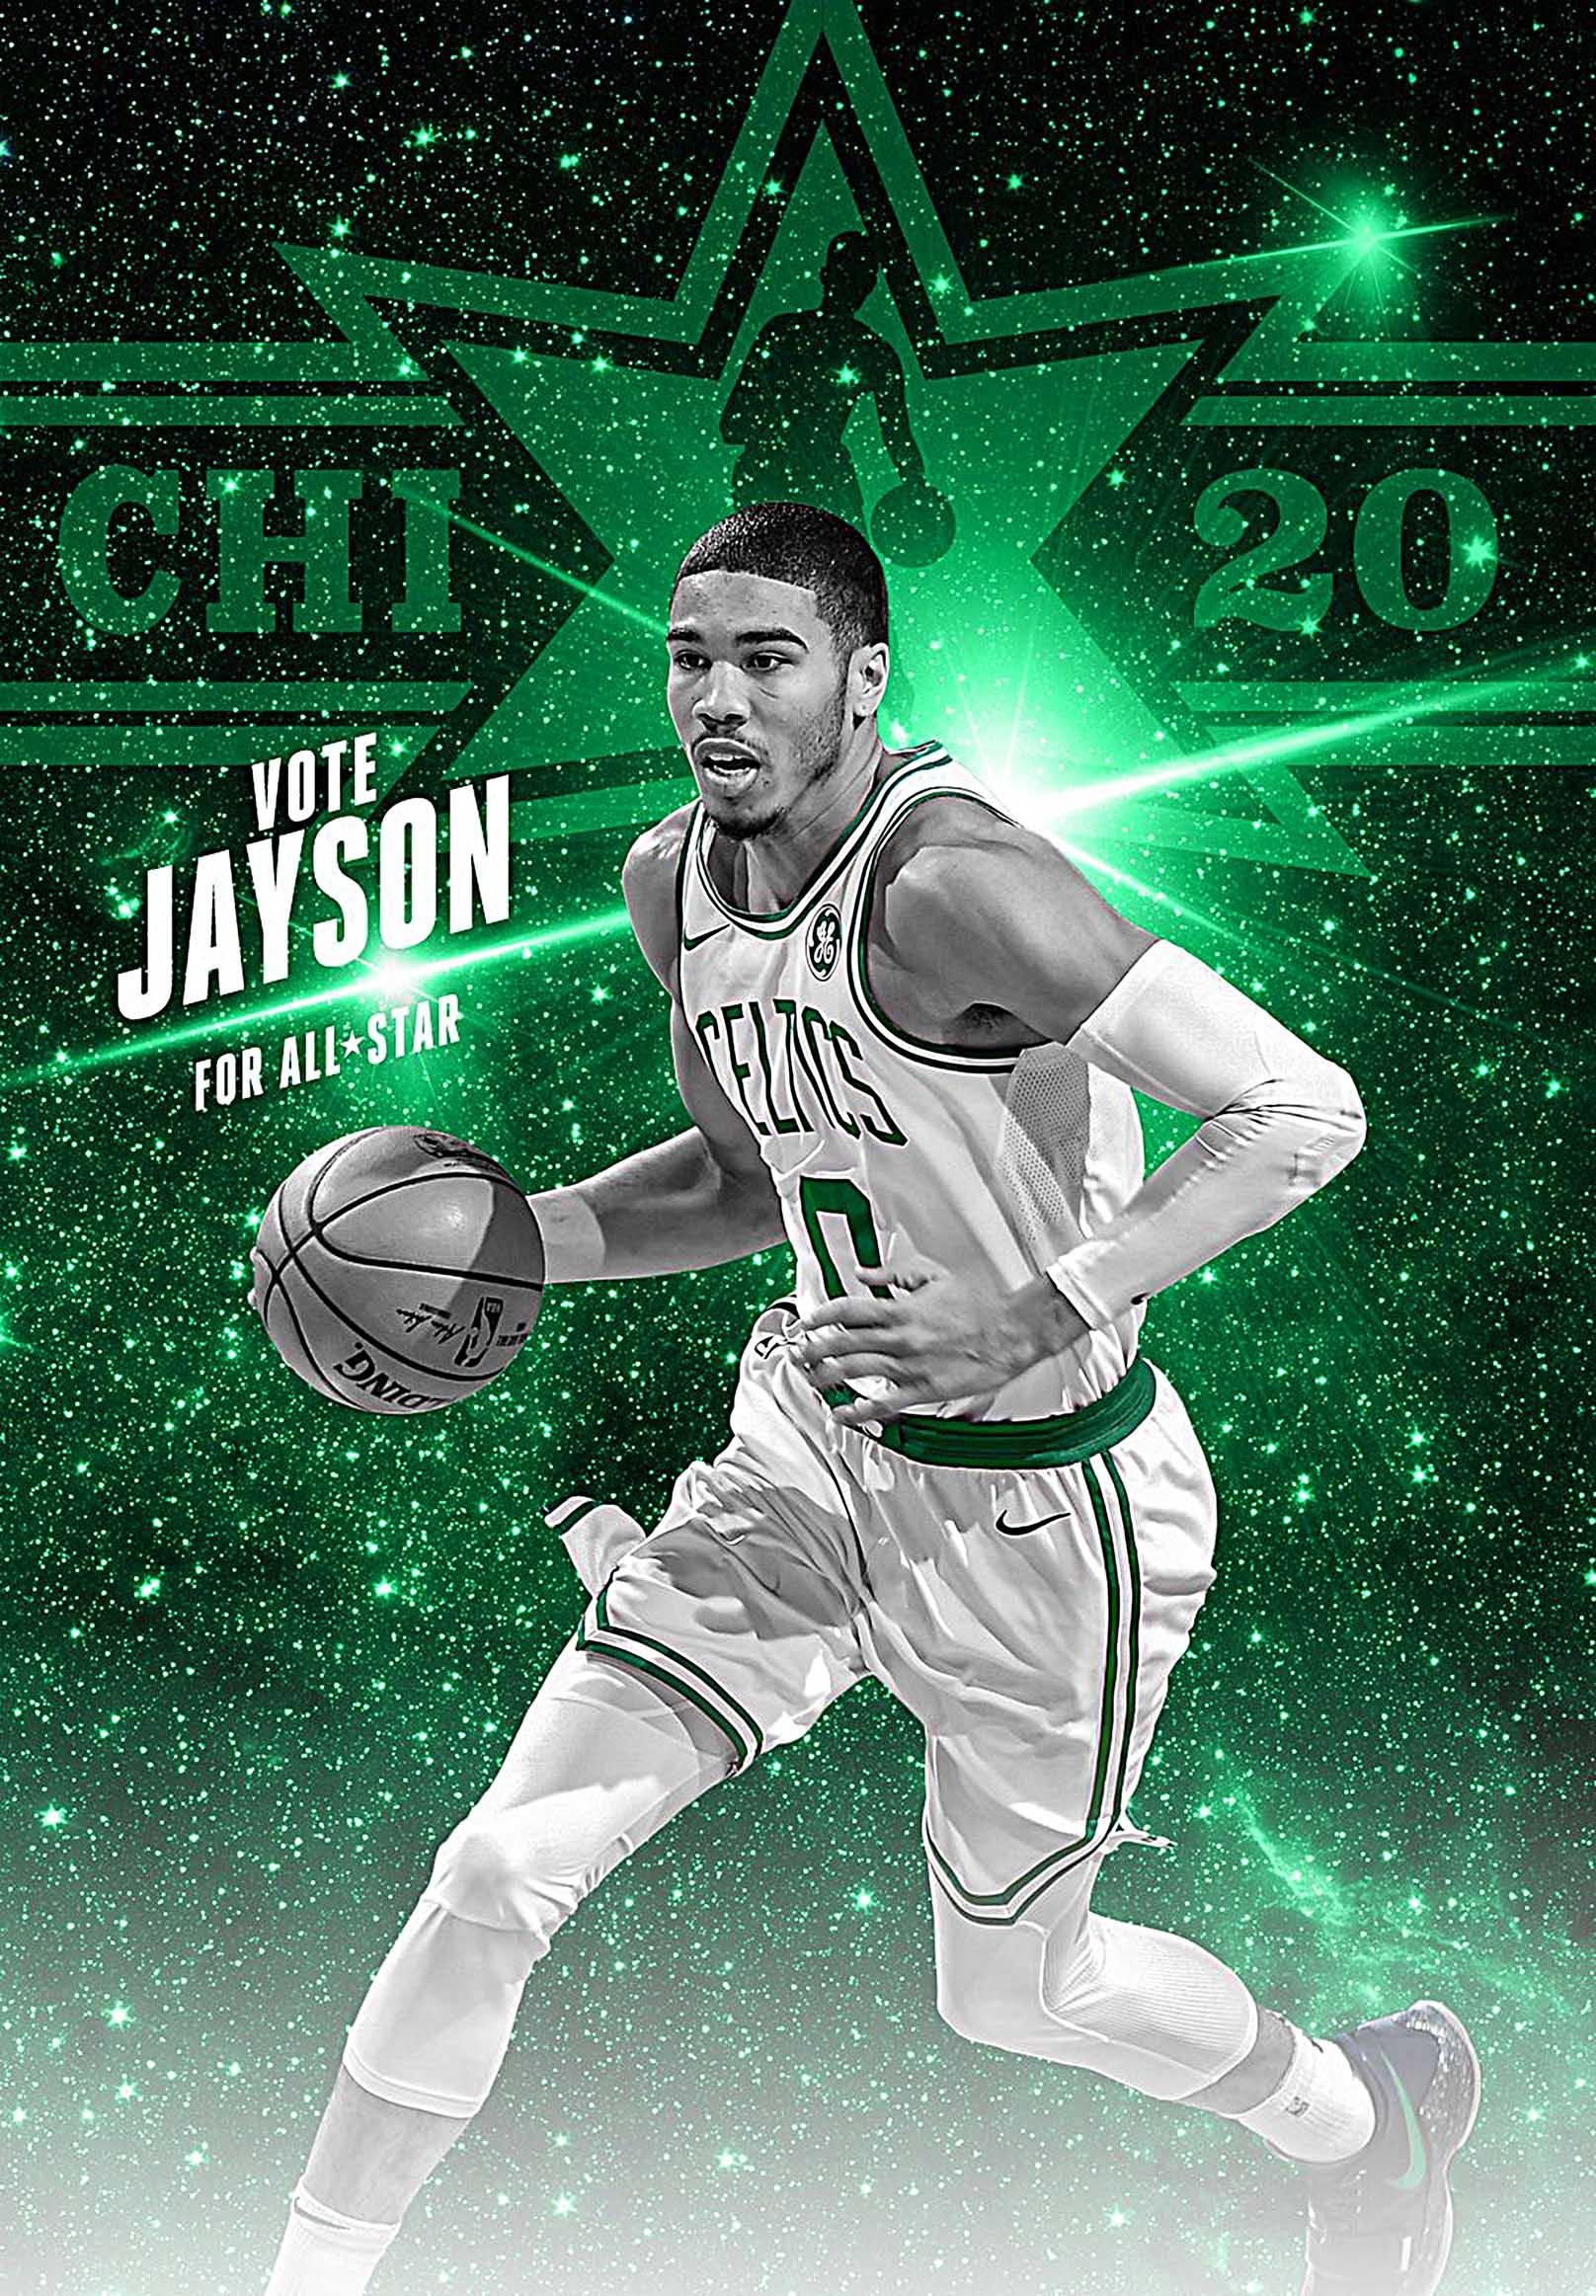 Boston Celtics Jayson Tatum Canvas Tablo (Nba-canvas-JaysonTatum)